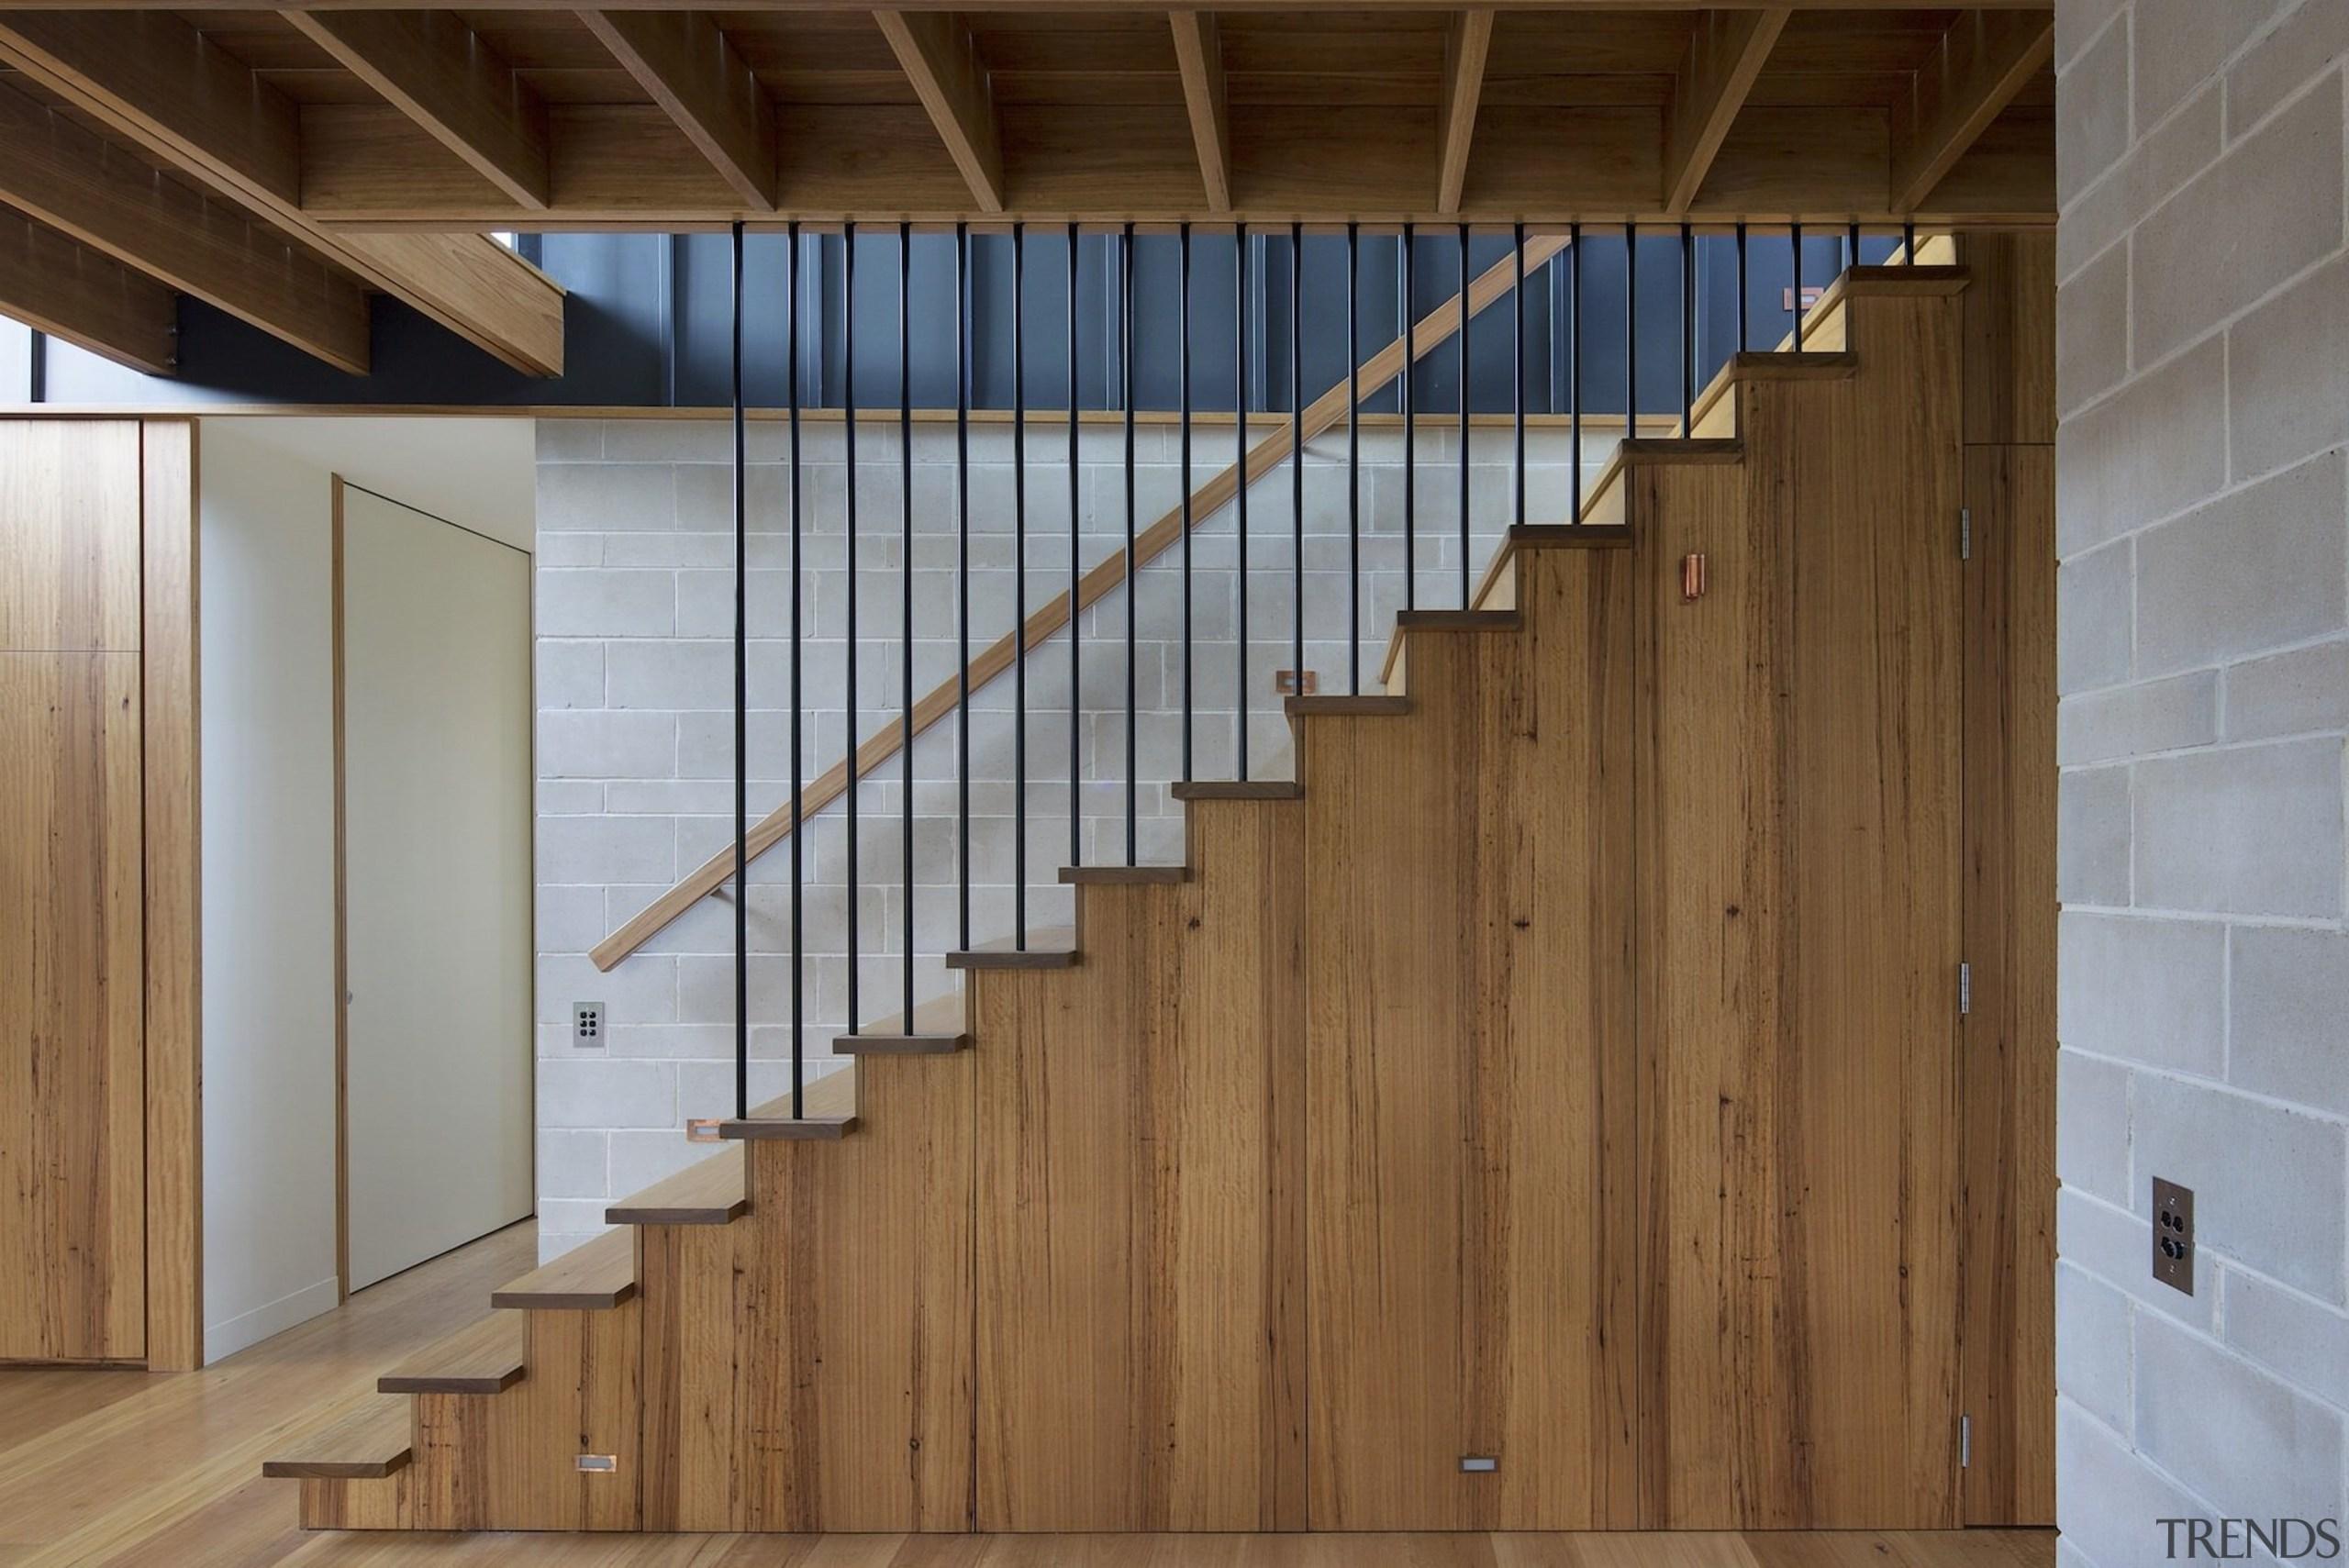 Wooden interiors gives a very rustic look - architecture, daylighting, door, facade, floor, flooring, handrail, hardwood, interior design, laminate flooring, stairs, structure, wall, wood, wood flooring, wood stain, brown, gray